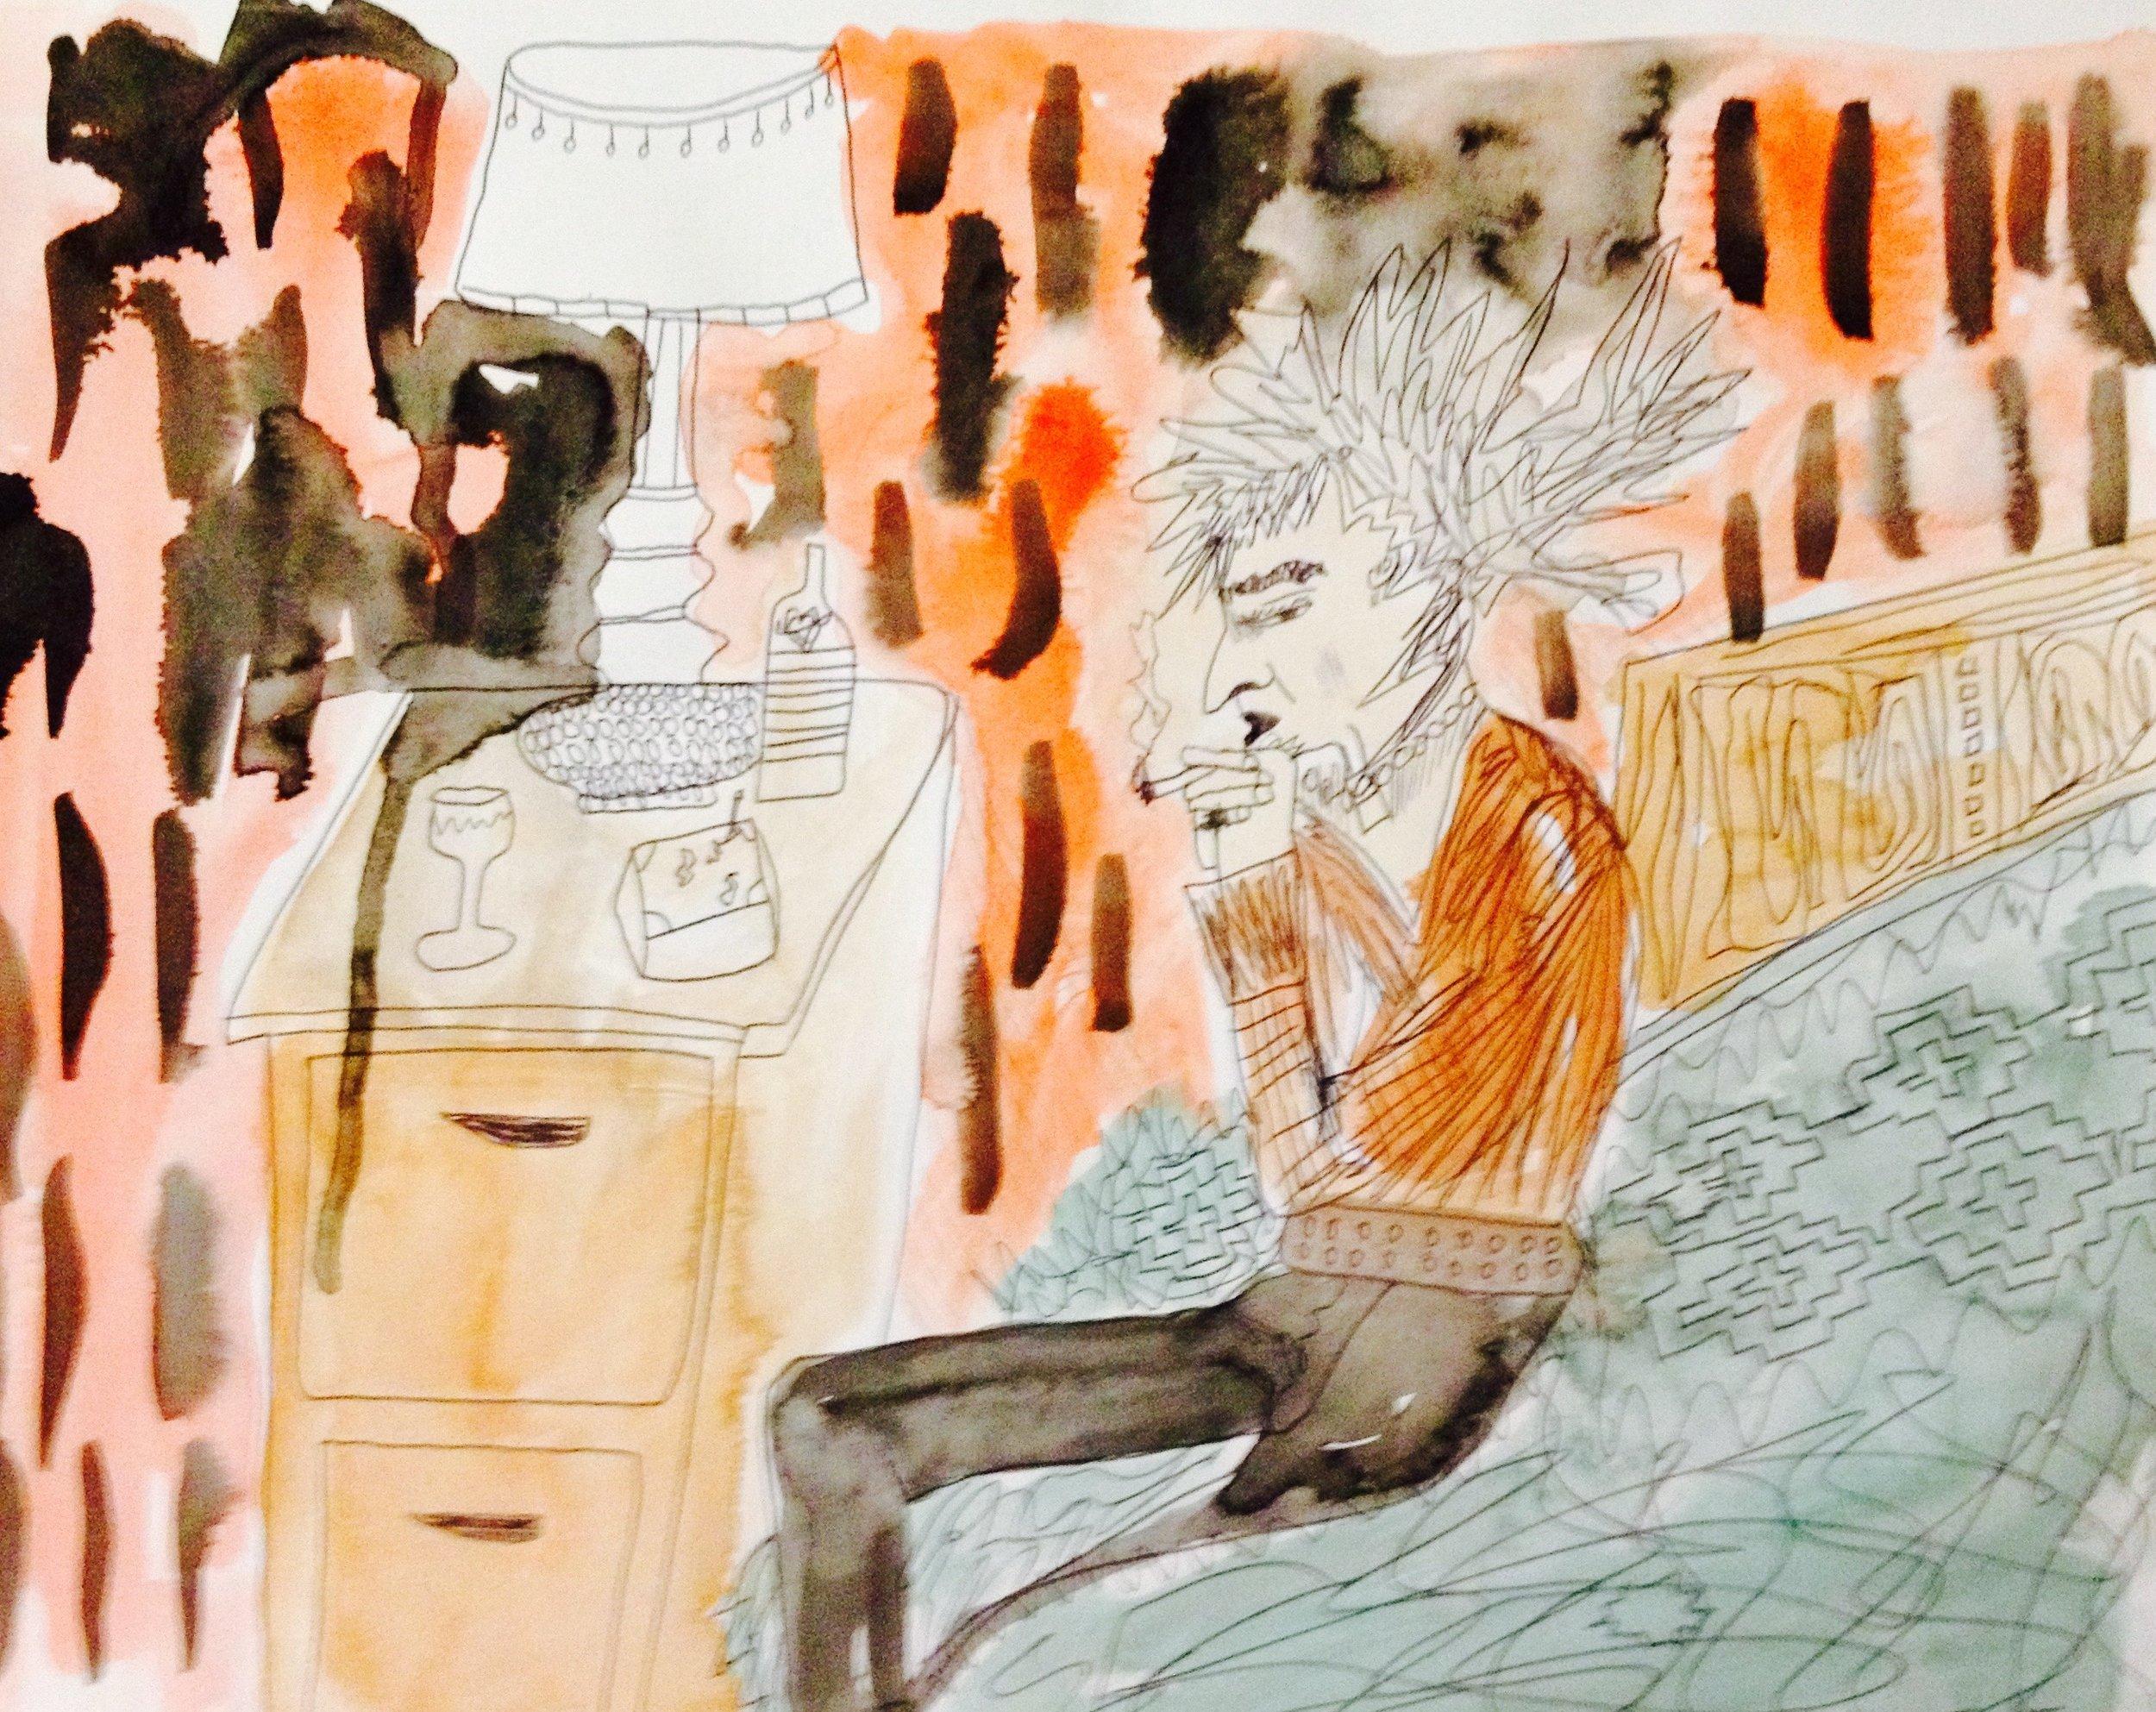 Sid Vicious by Kathryn Sturges